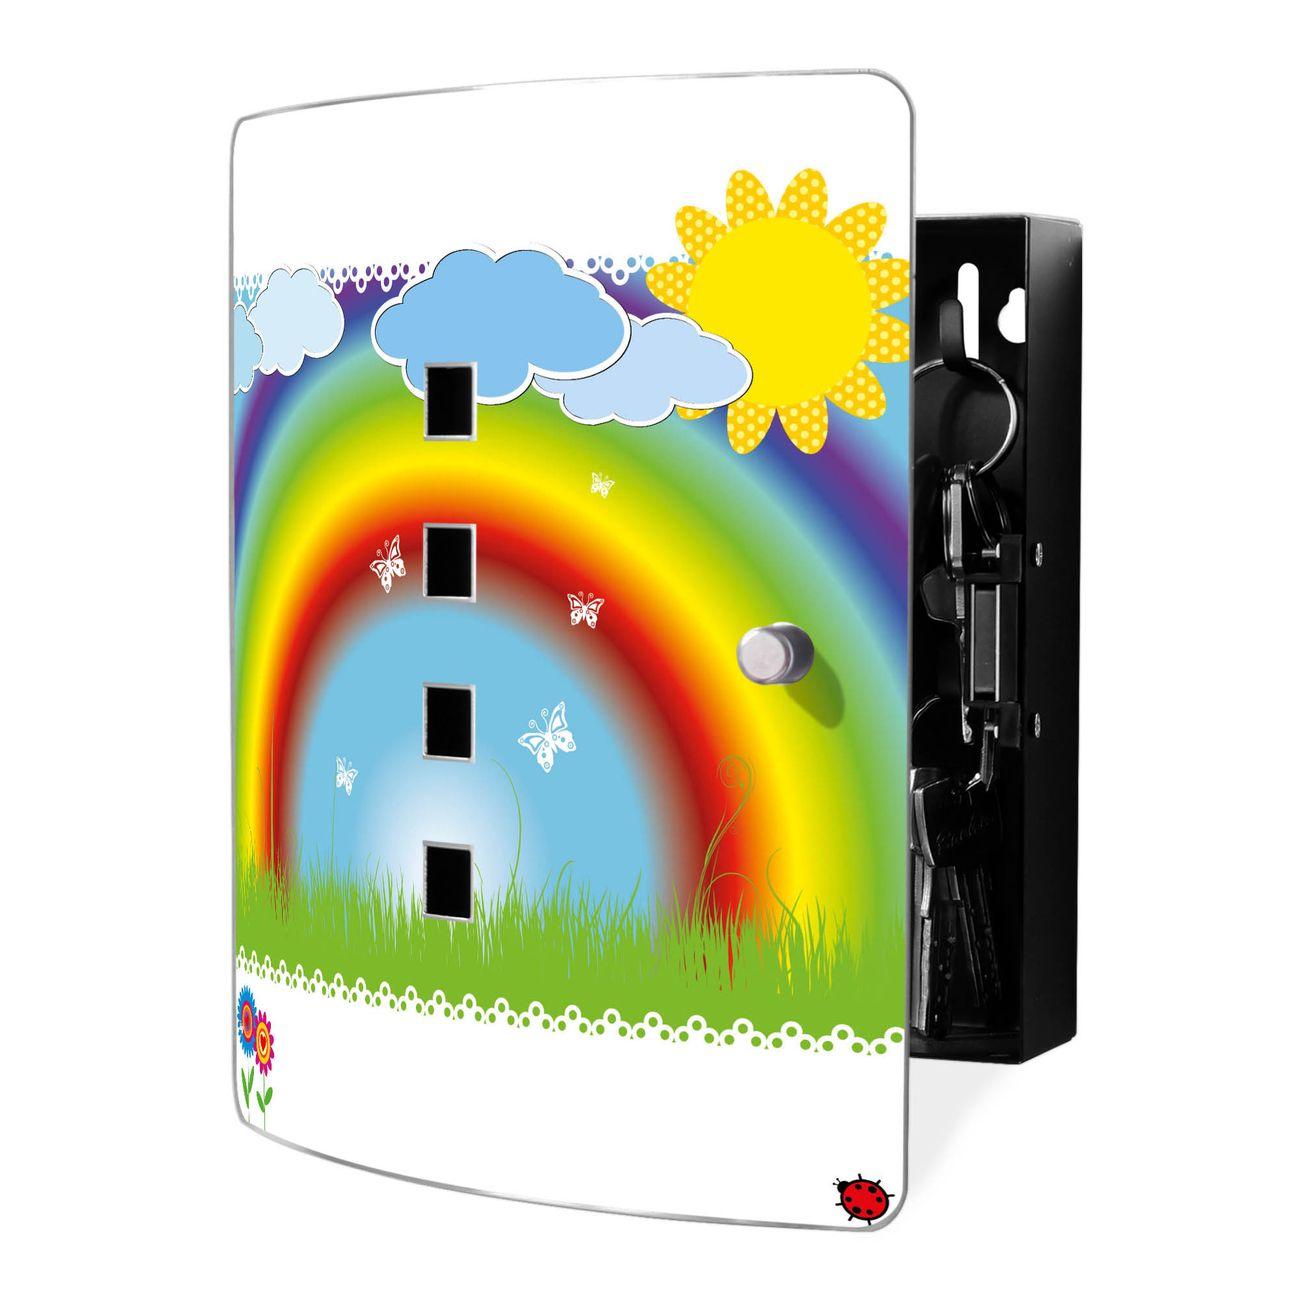 Schlüsselkasten Motiv Regenbogen